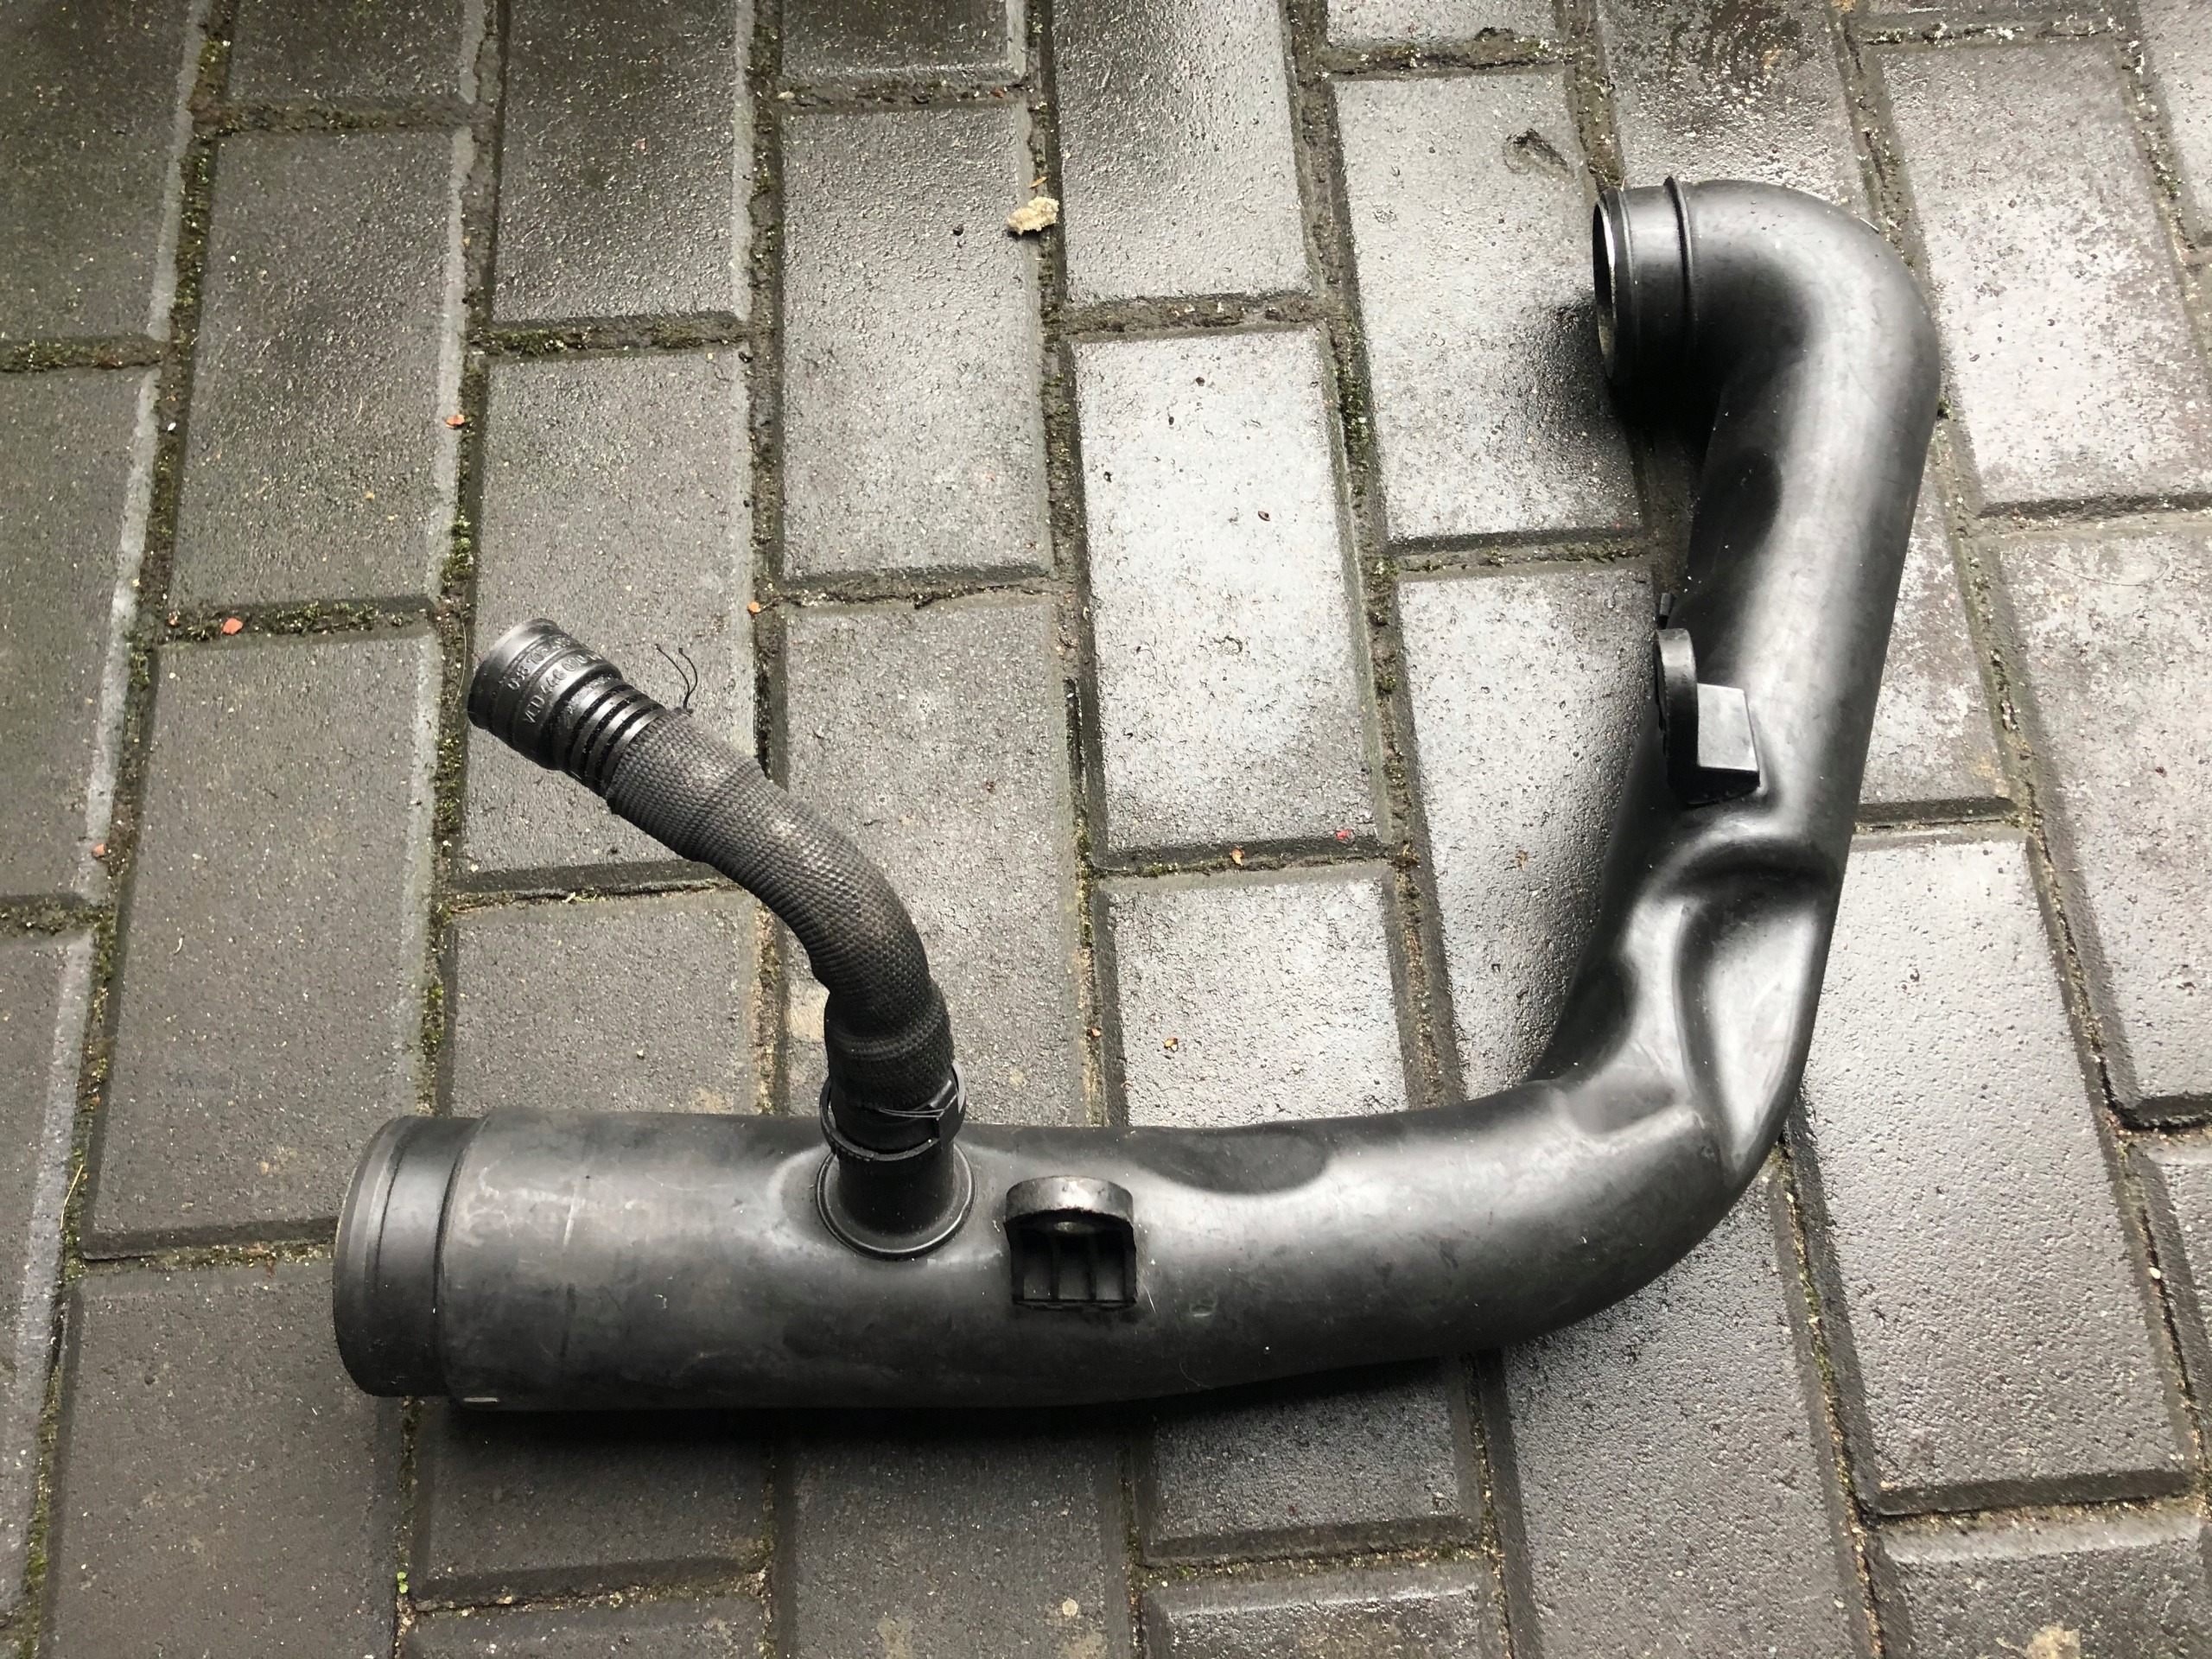 RURA DOLOT PRZEWÓD AUDI VW SEAT SKODA 1.9 TDI 6